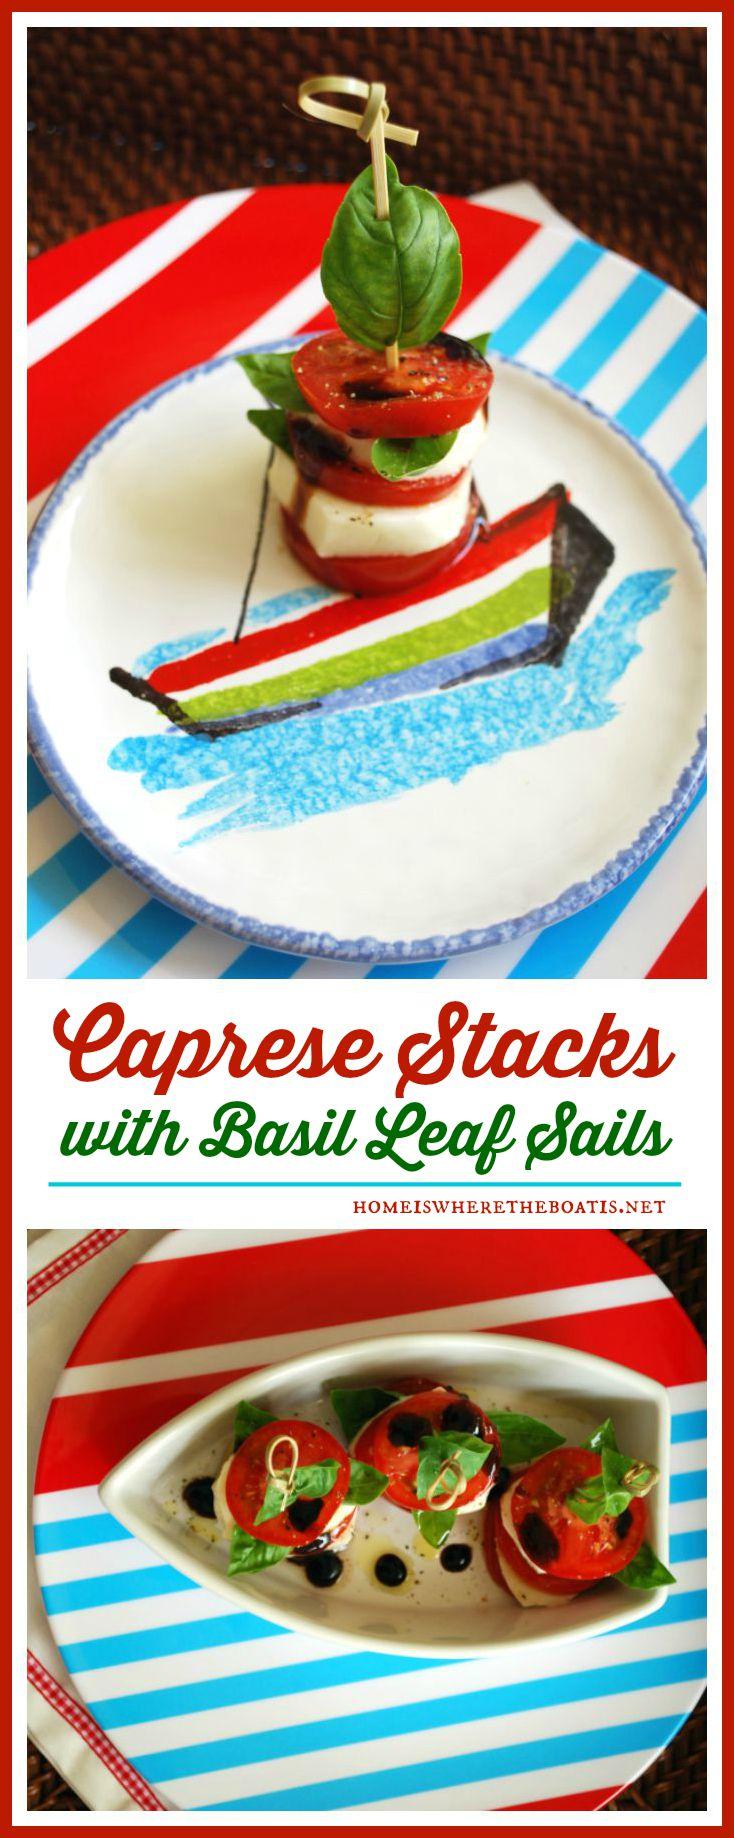 Caprese Stacks with Basil Leaf Sails